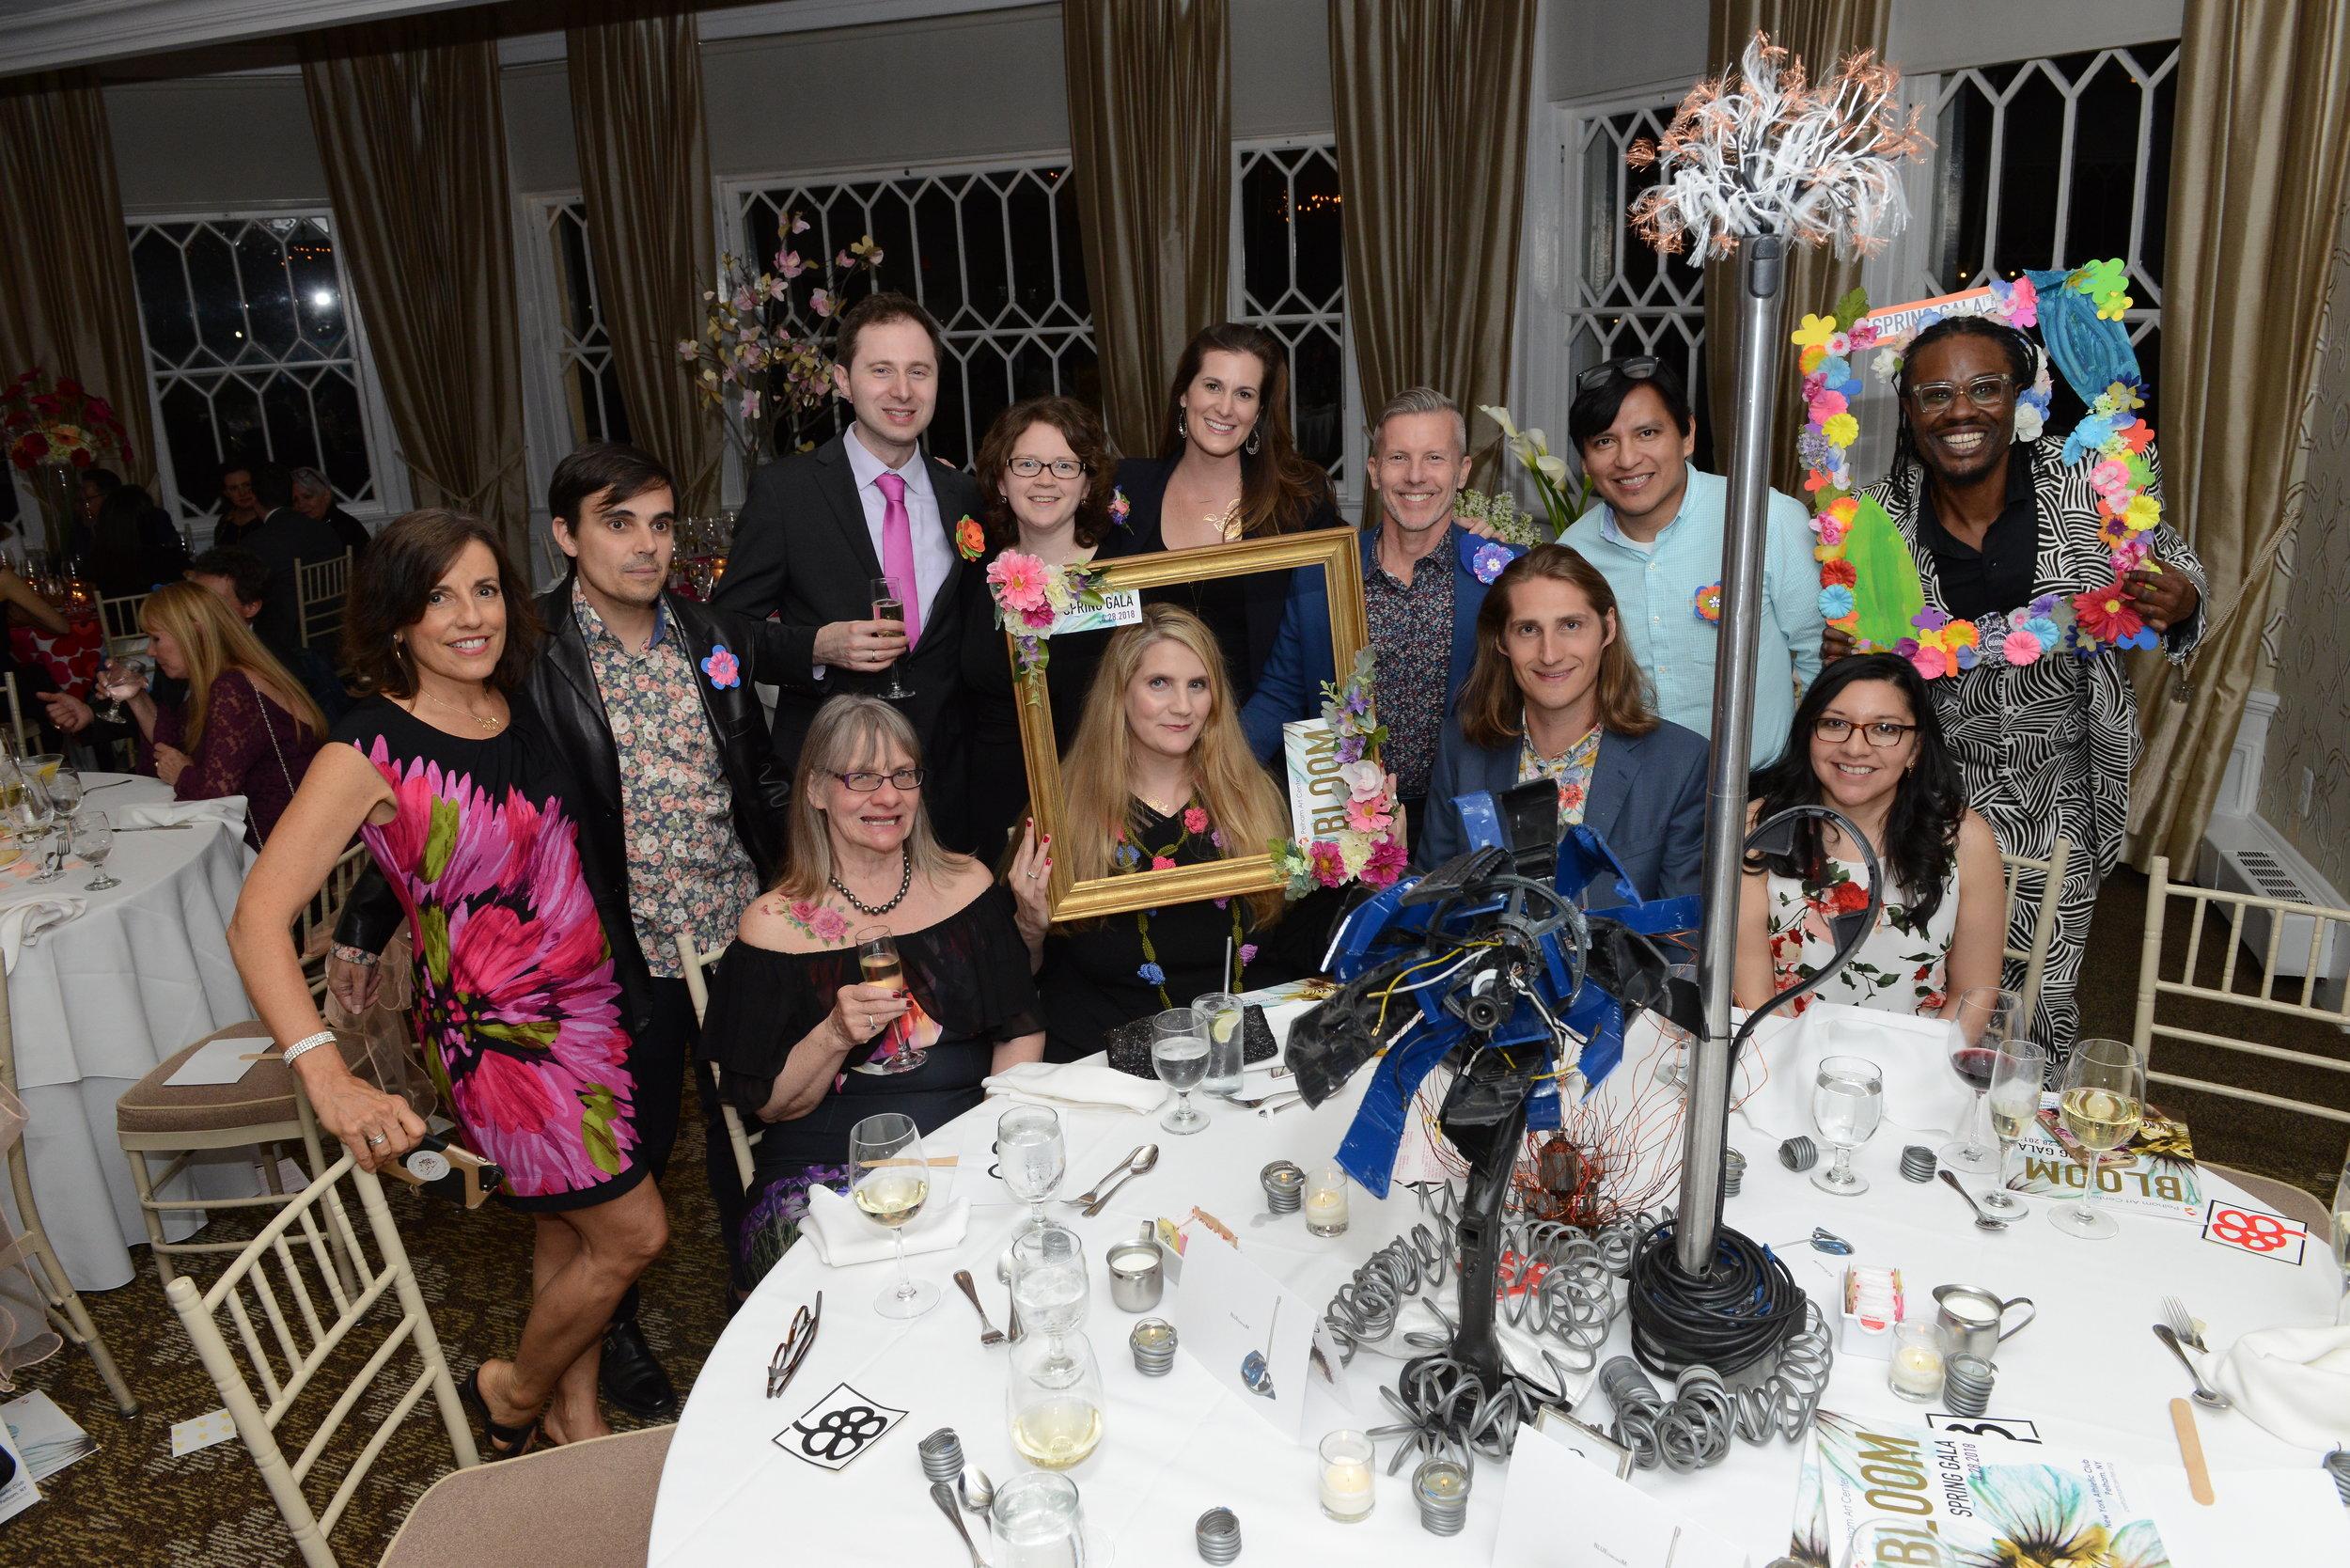 Group photo at Walters Table.jpg